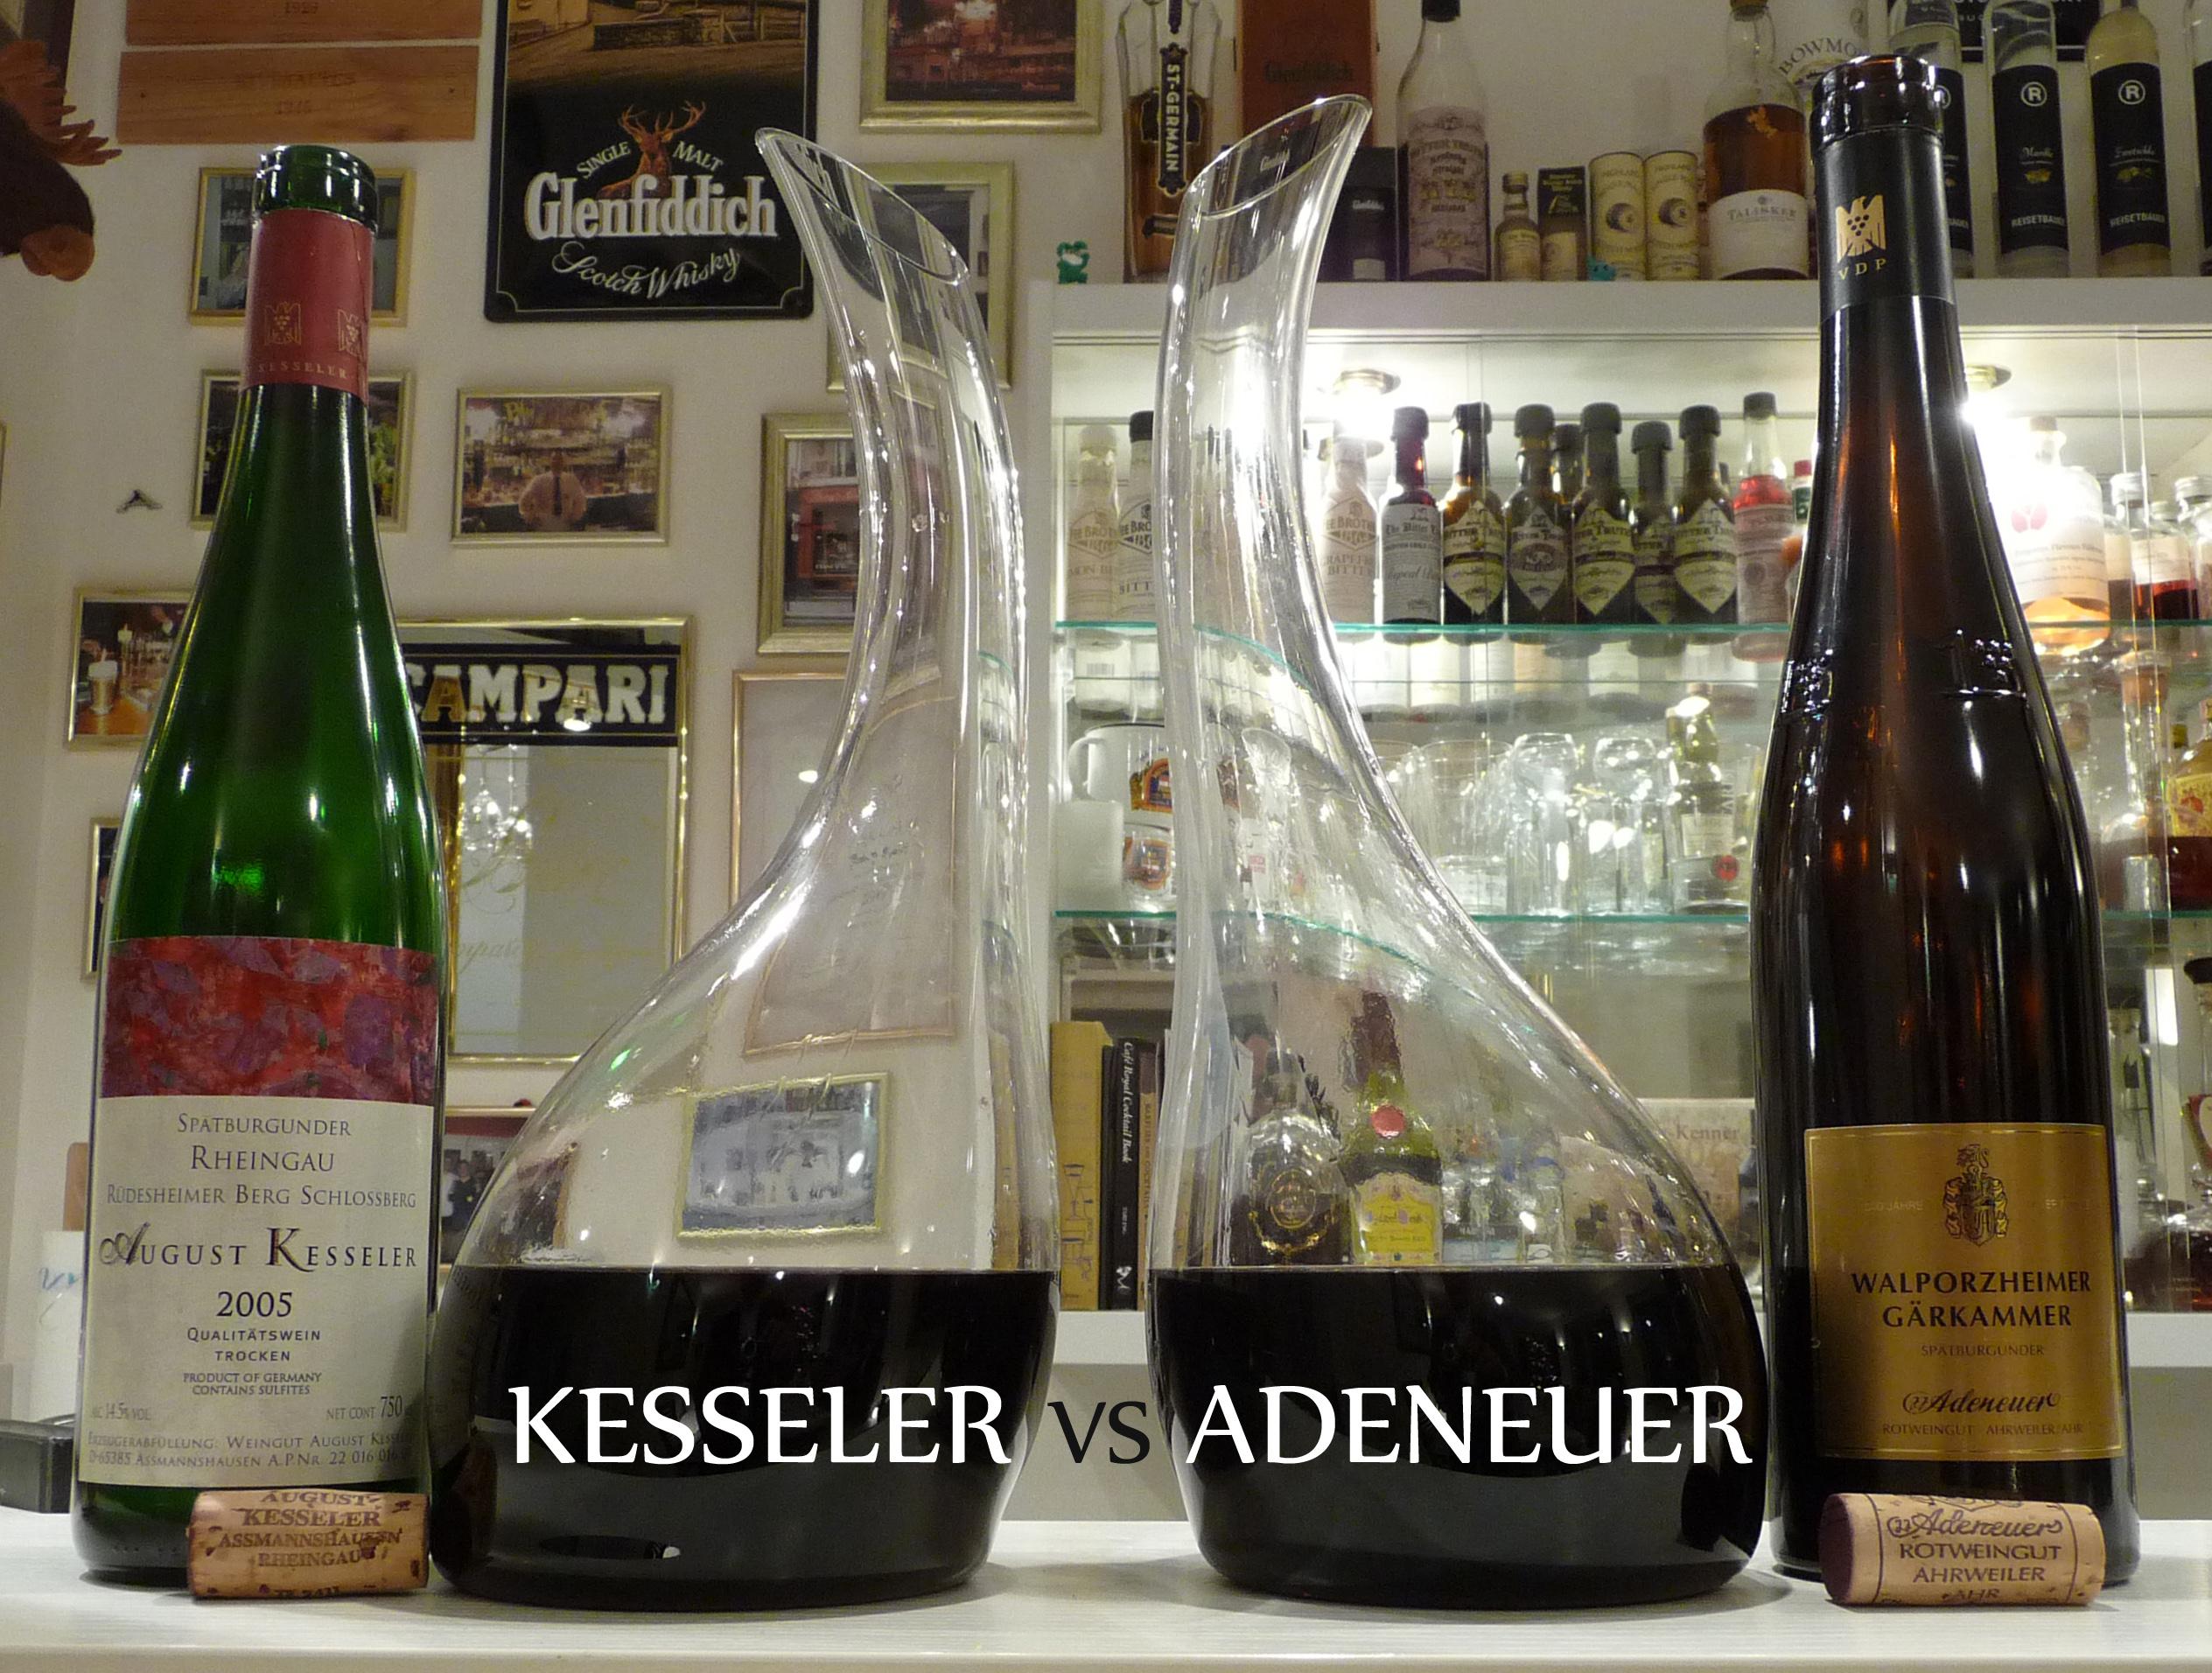 Kesseler vs Adeneuer